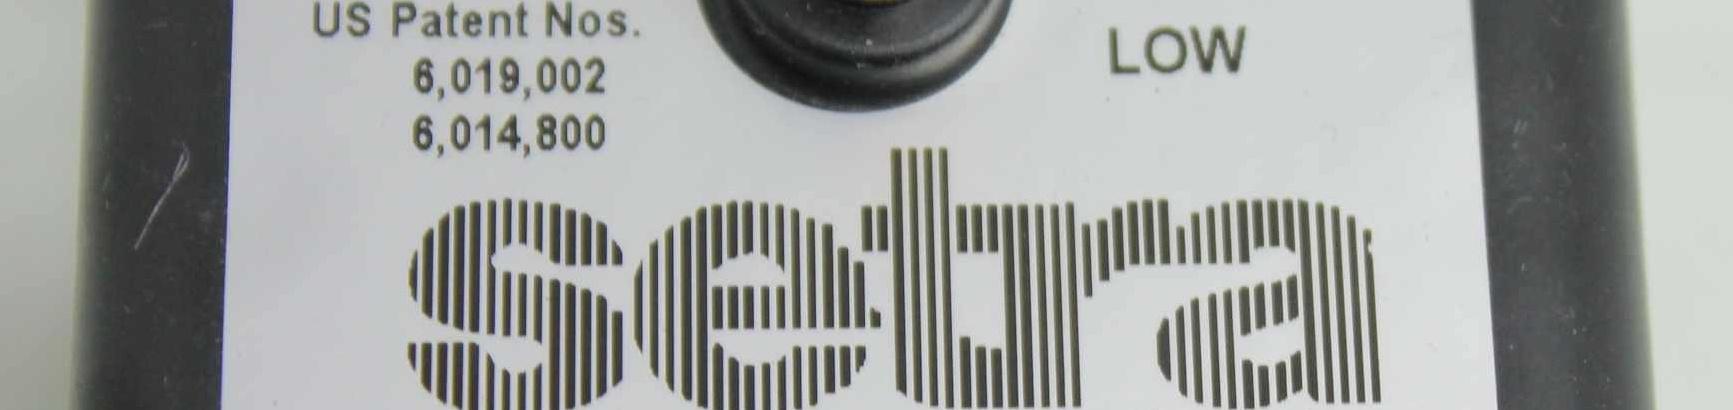 setra-product-logo-236480-edited.jpg